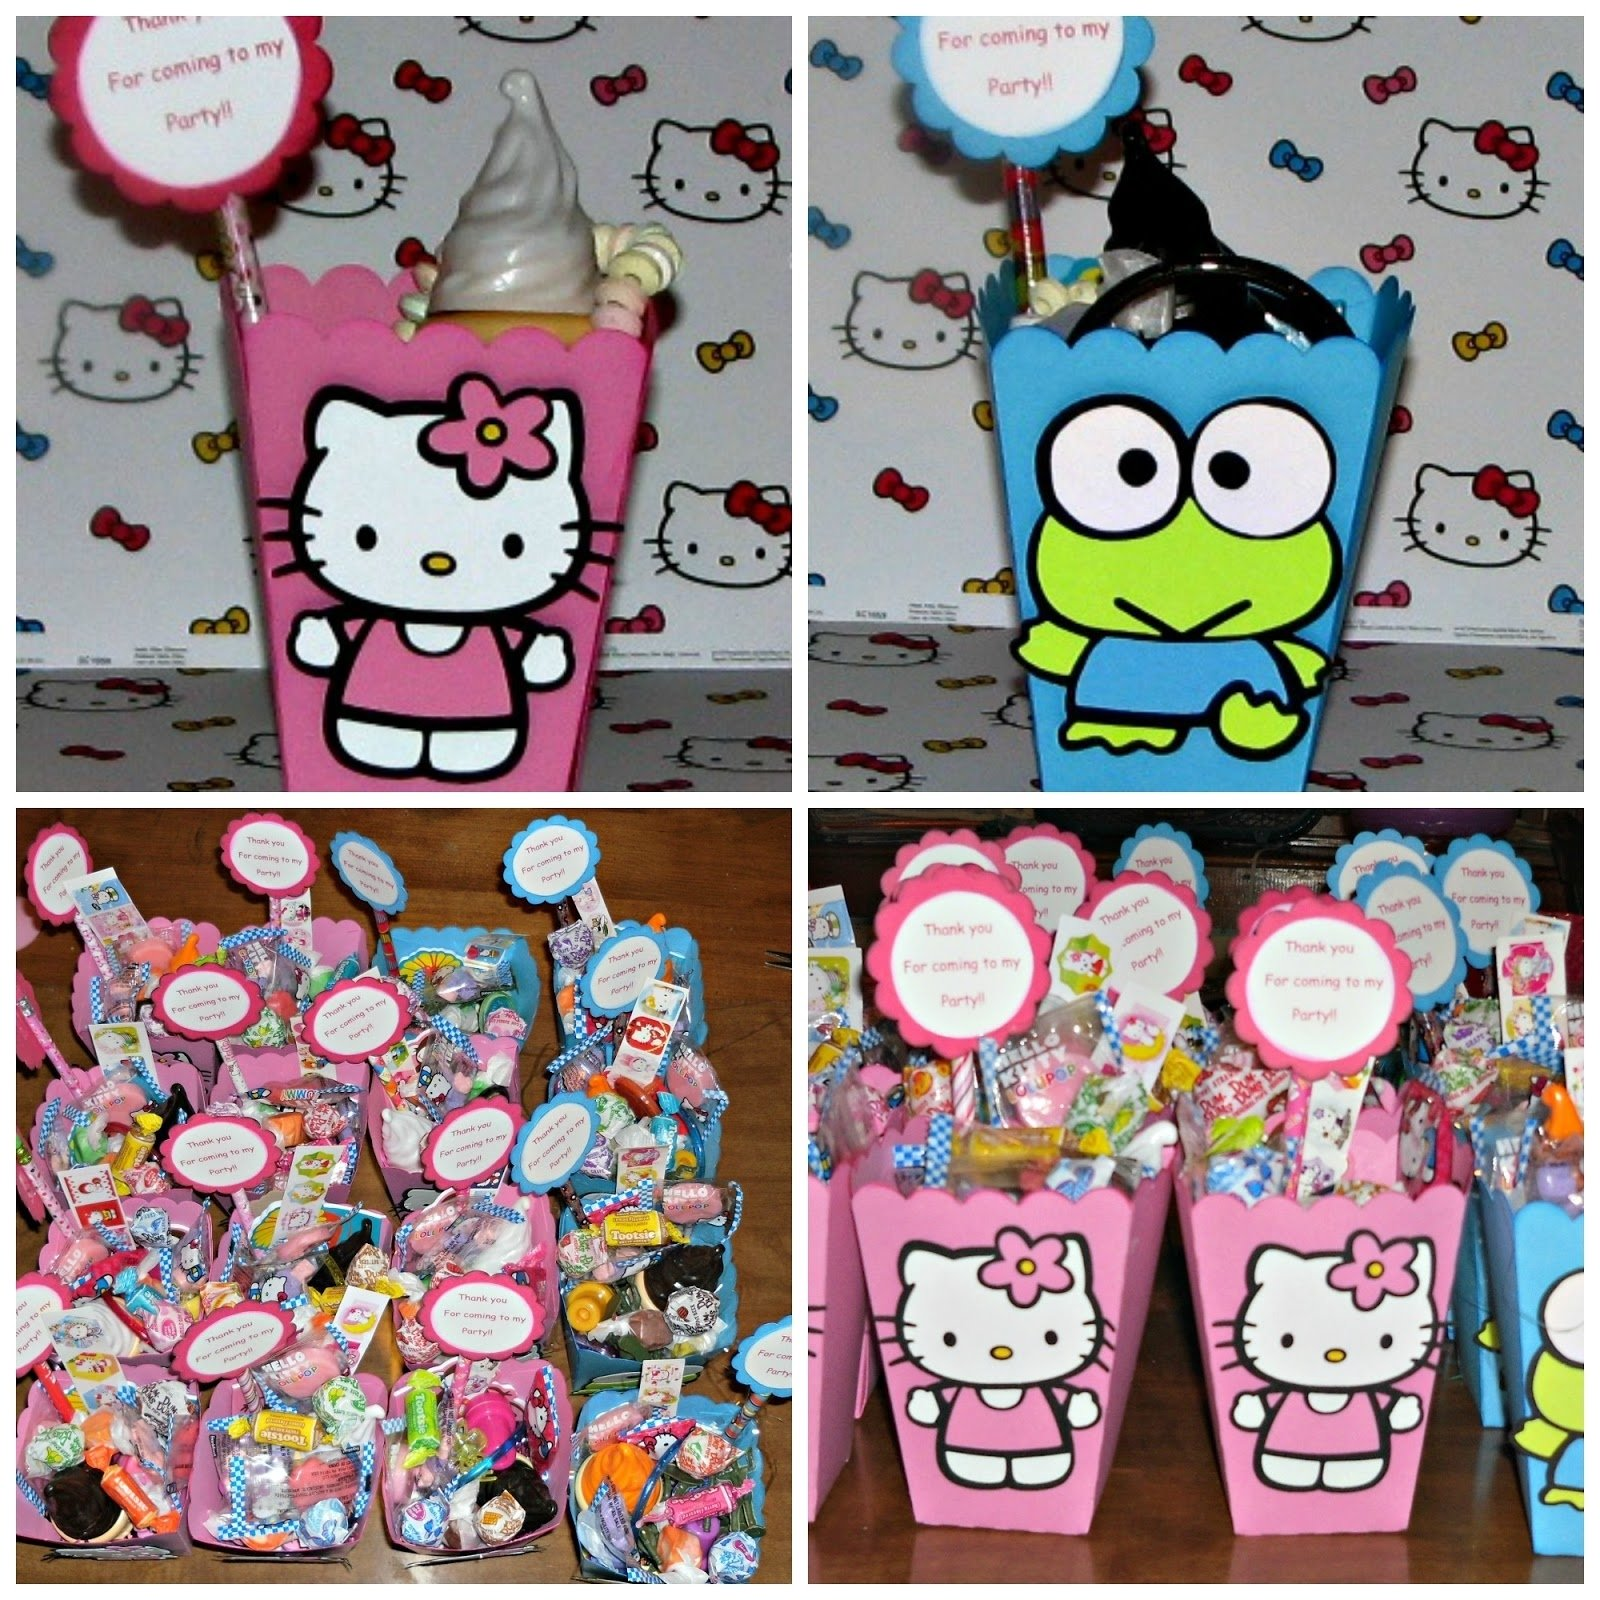 10 Lovable Hello Kitty Party Favor Ideas creationscolleen hello kitty birthday party 2020